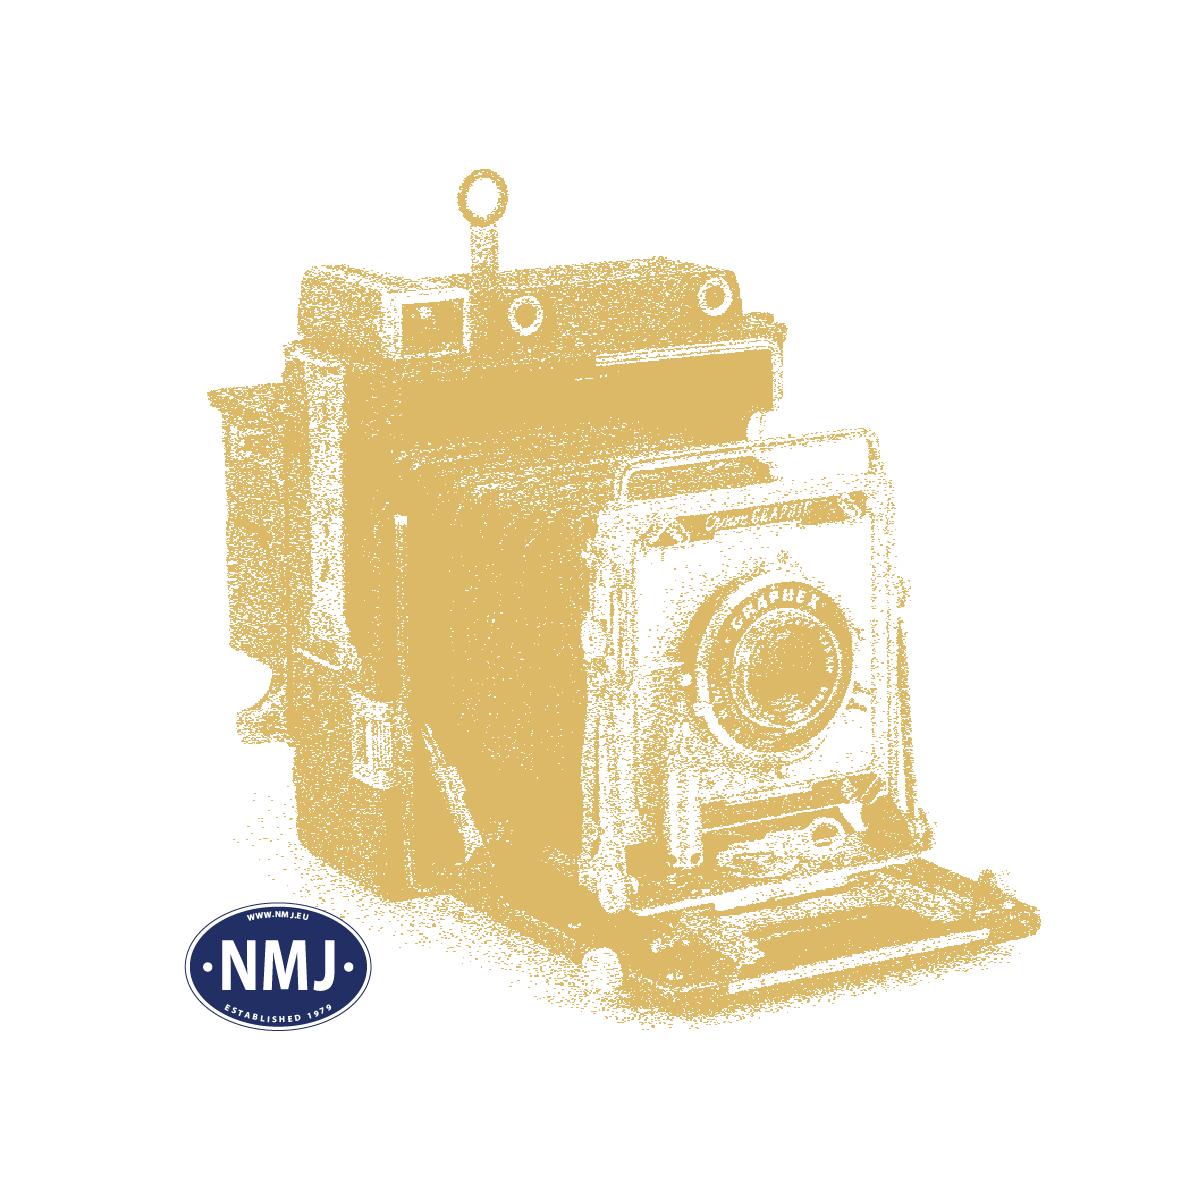 NMJT80.202AC - NMJ Topline NSB EL17.2229 (V2.0) rot/schwarz, DC